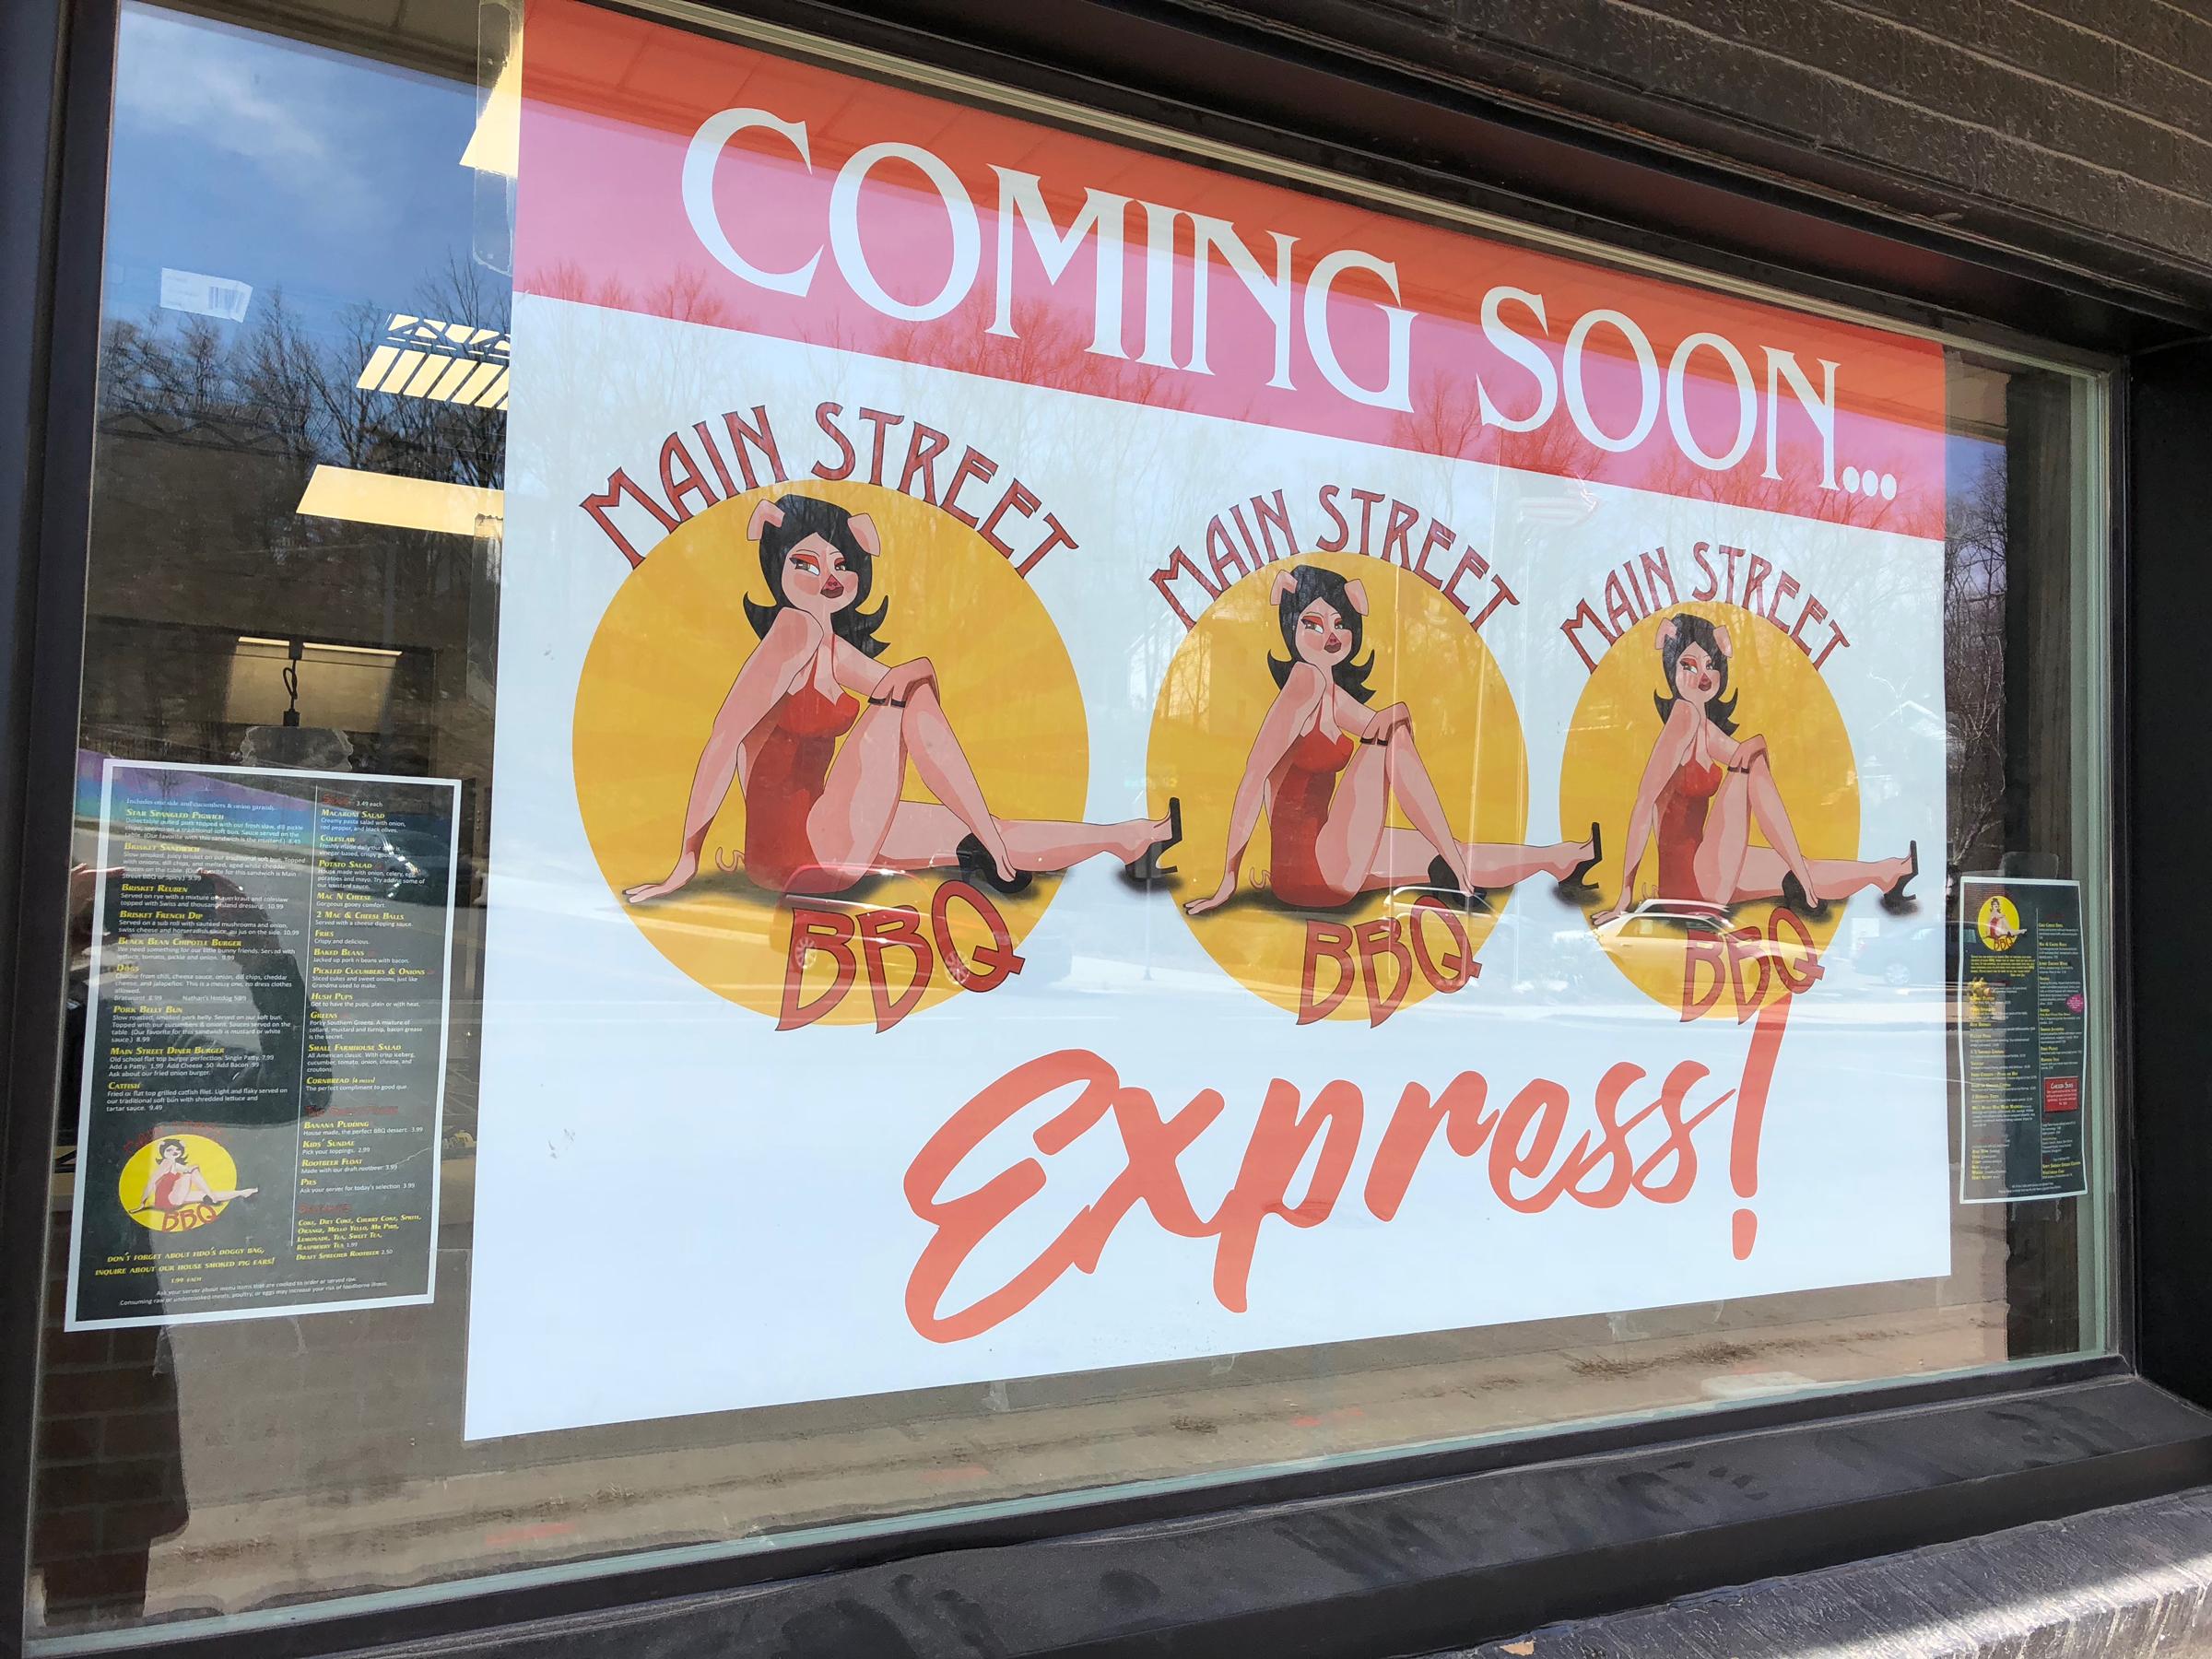 Main Street BBQ Express